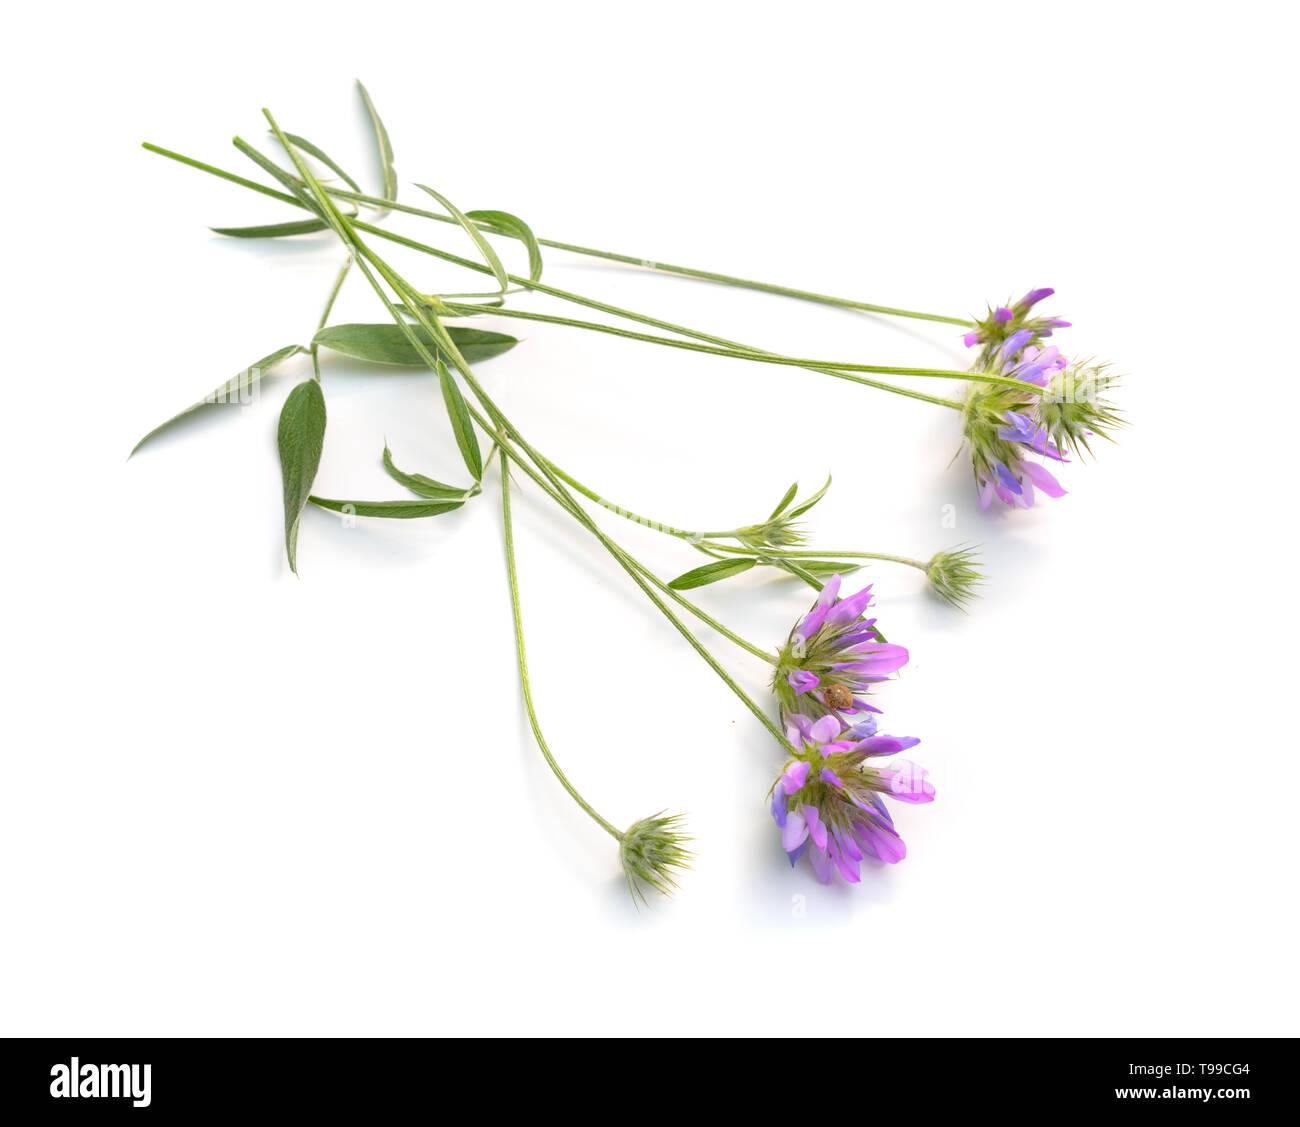 Bituminaria bituminosa, the Arabian pea or pitch trefoil isolated. Stock Photo